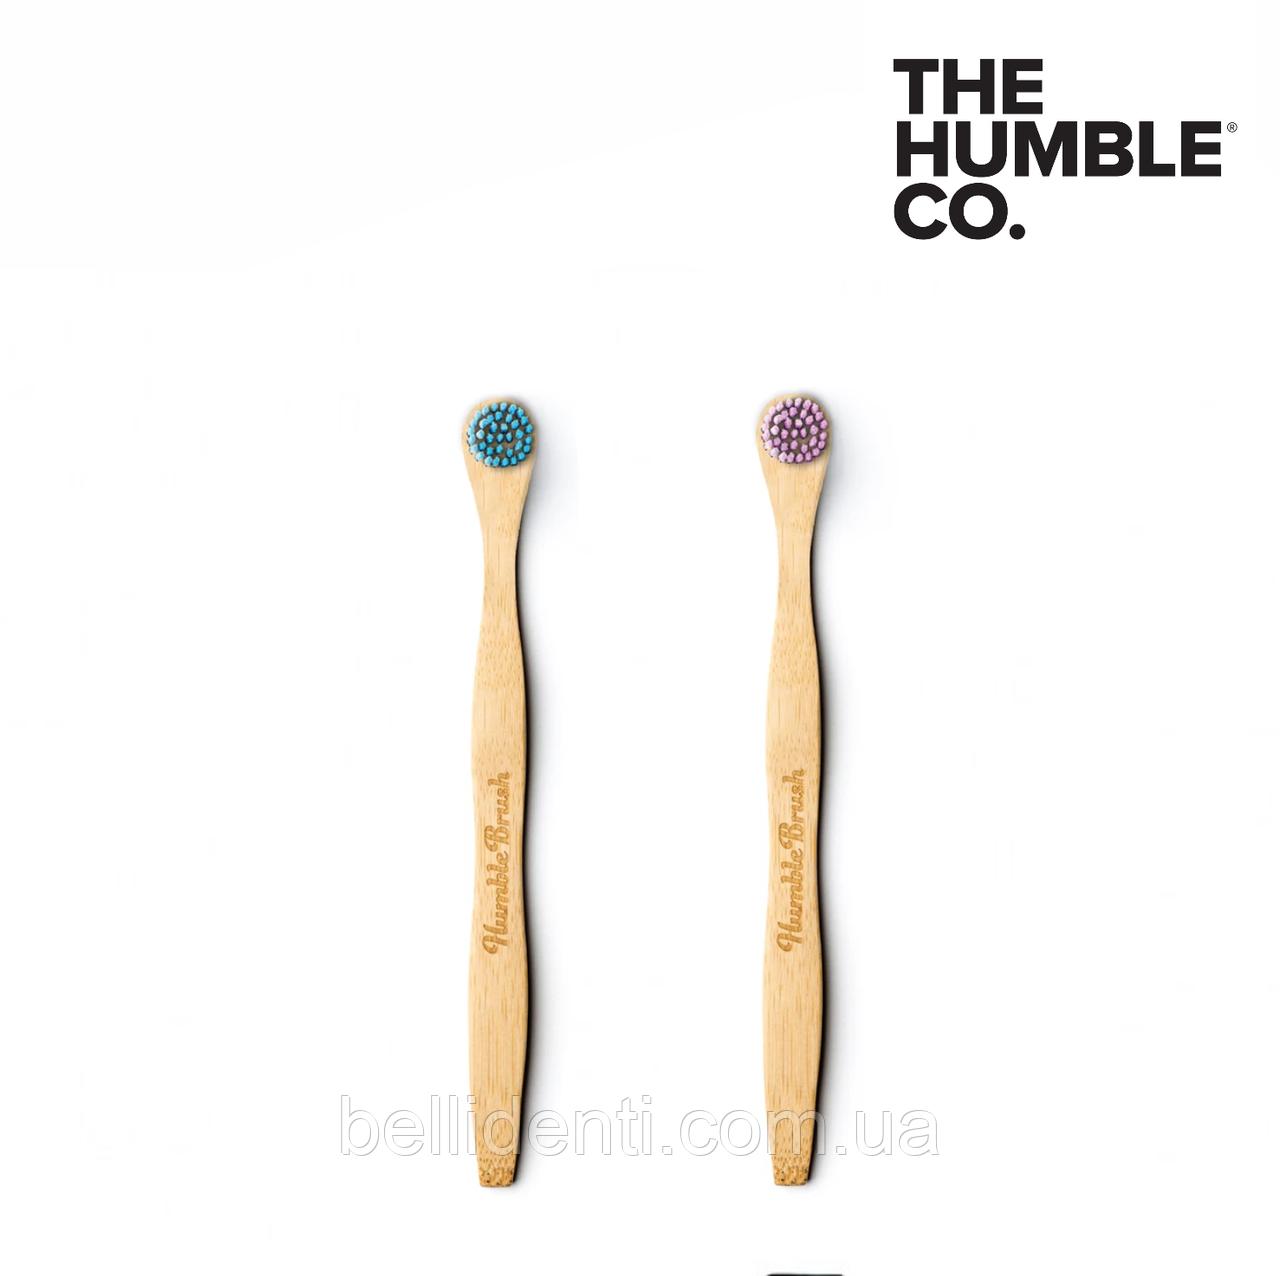 Очиститель языка The Humble Co, 1 шт